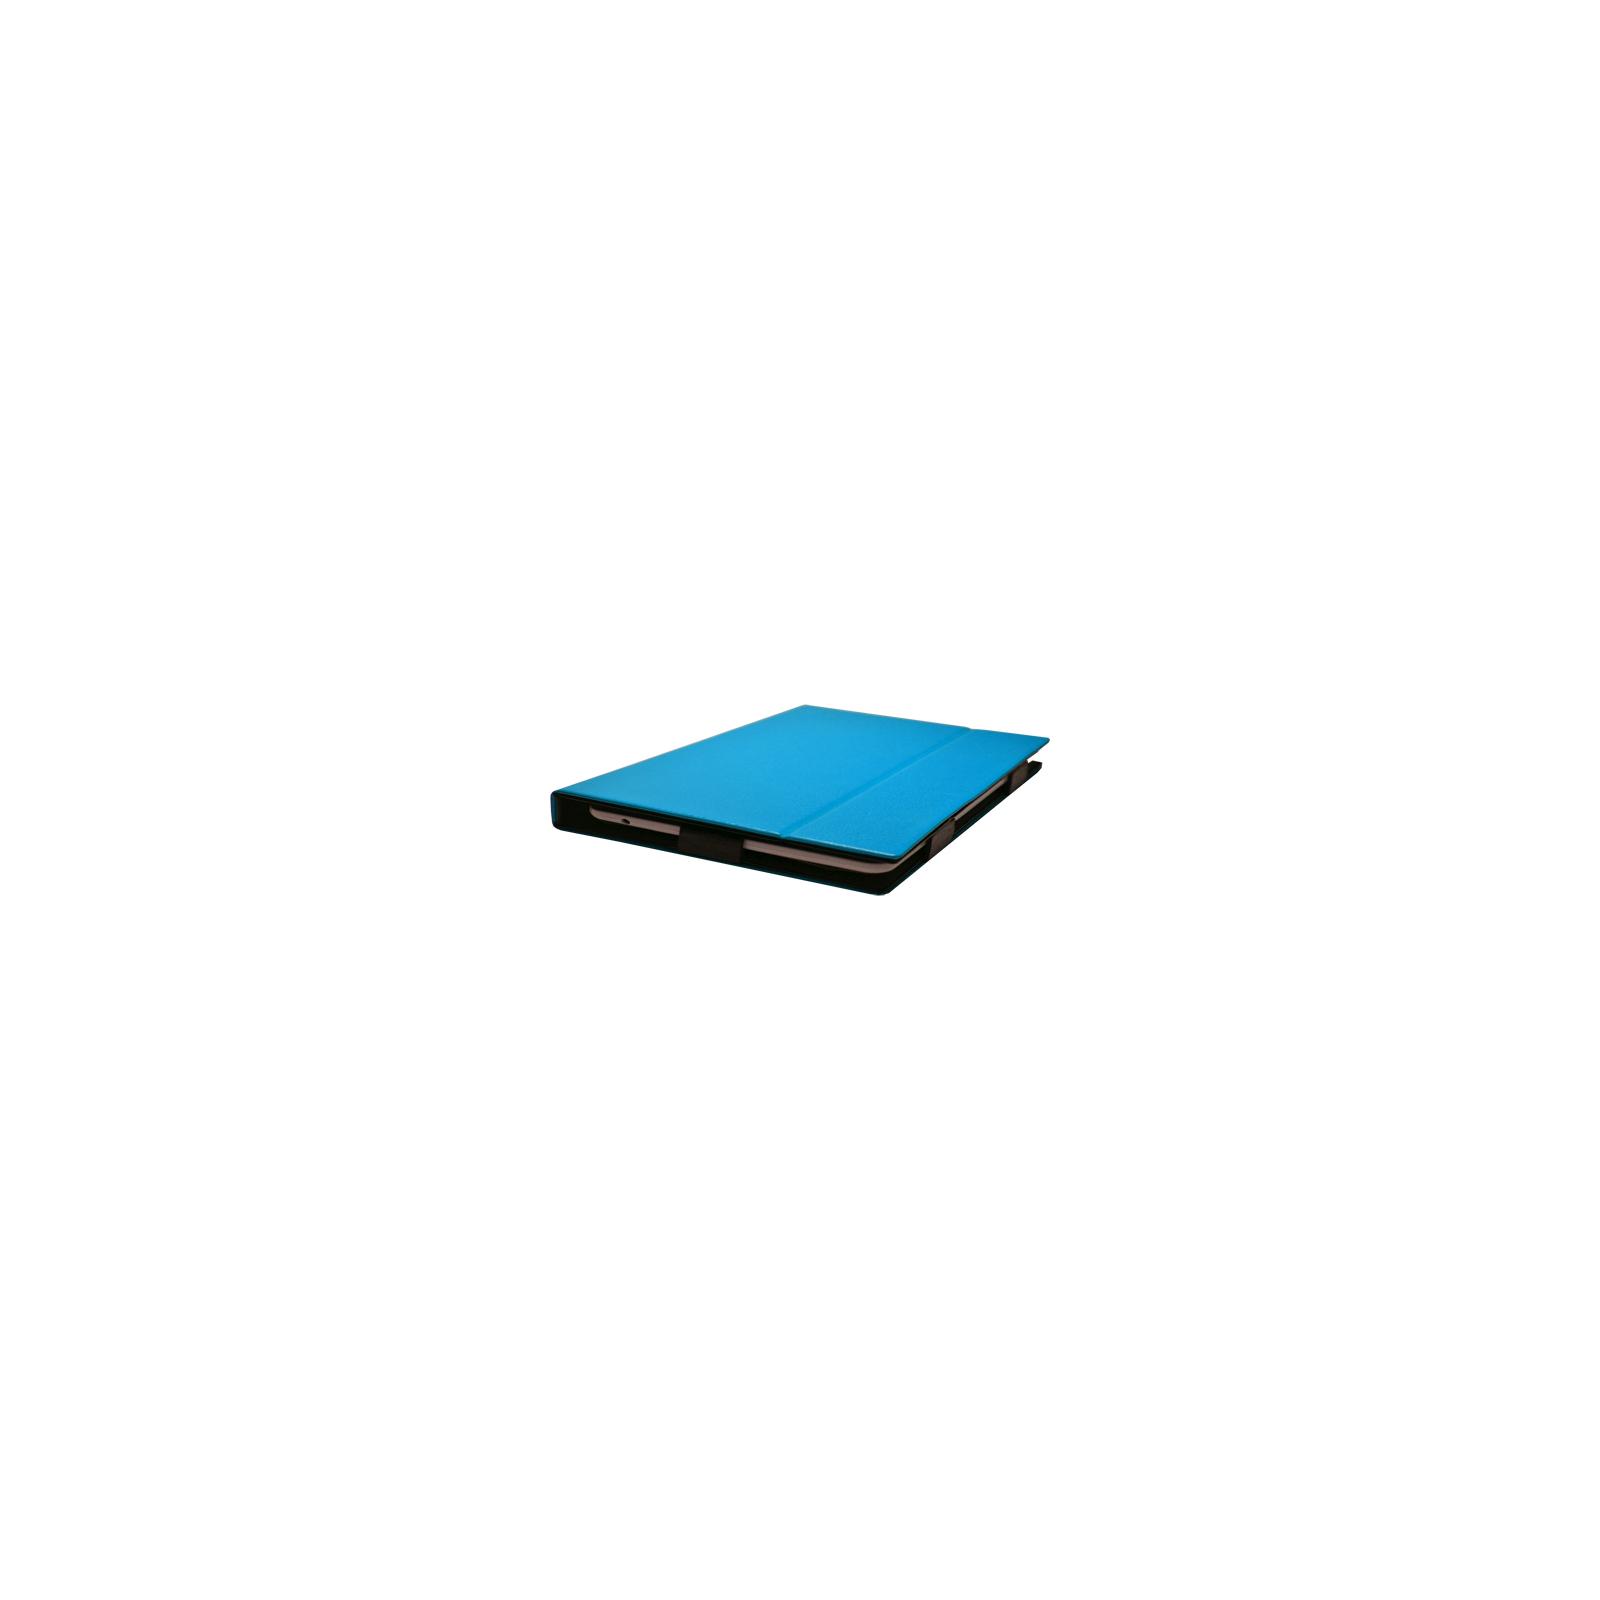 Чехол для планшета Vento 10.1 Desire Bright -blue изображение 3